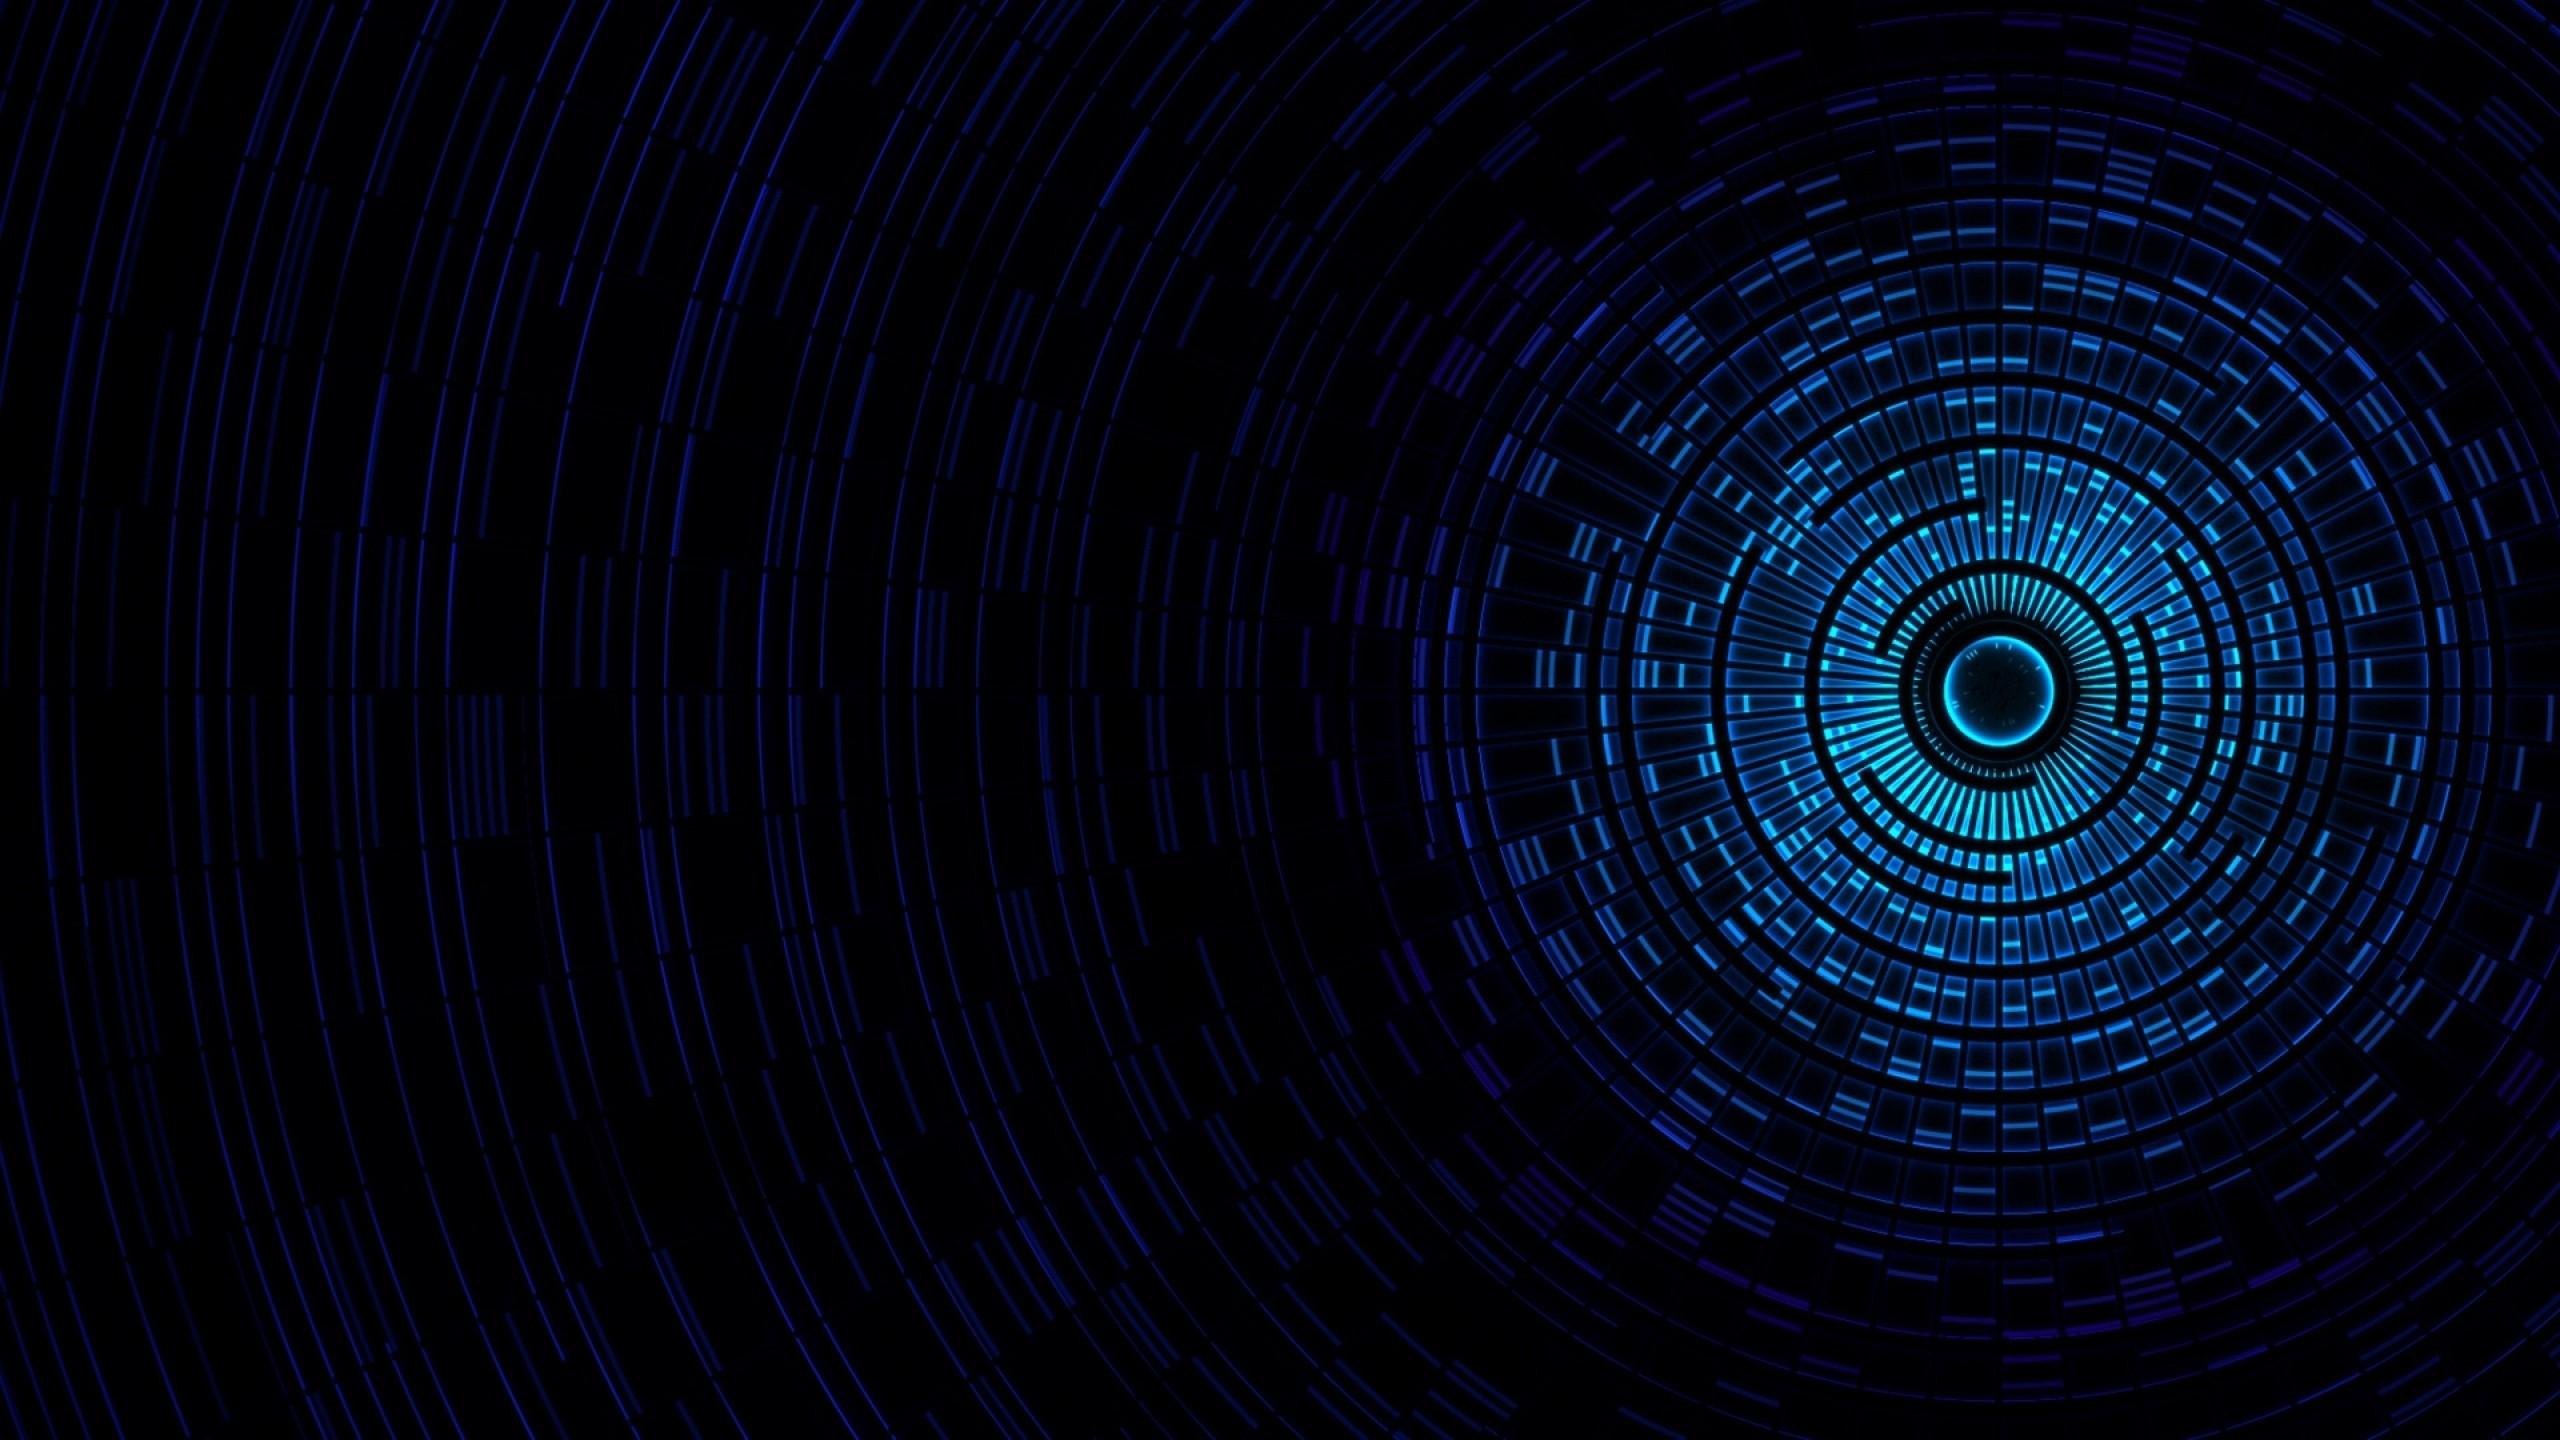 Wallpaper abstraction, passage, light, black, blue